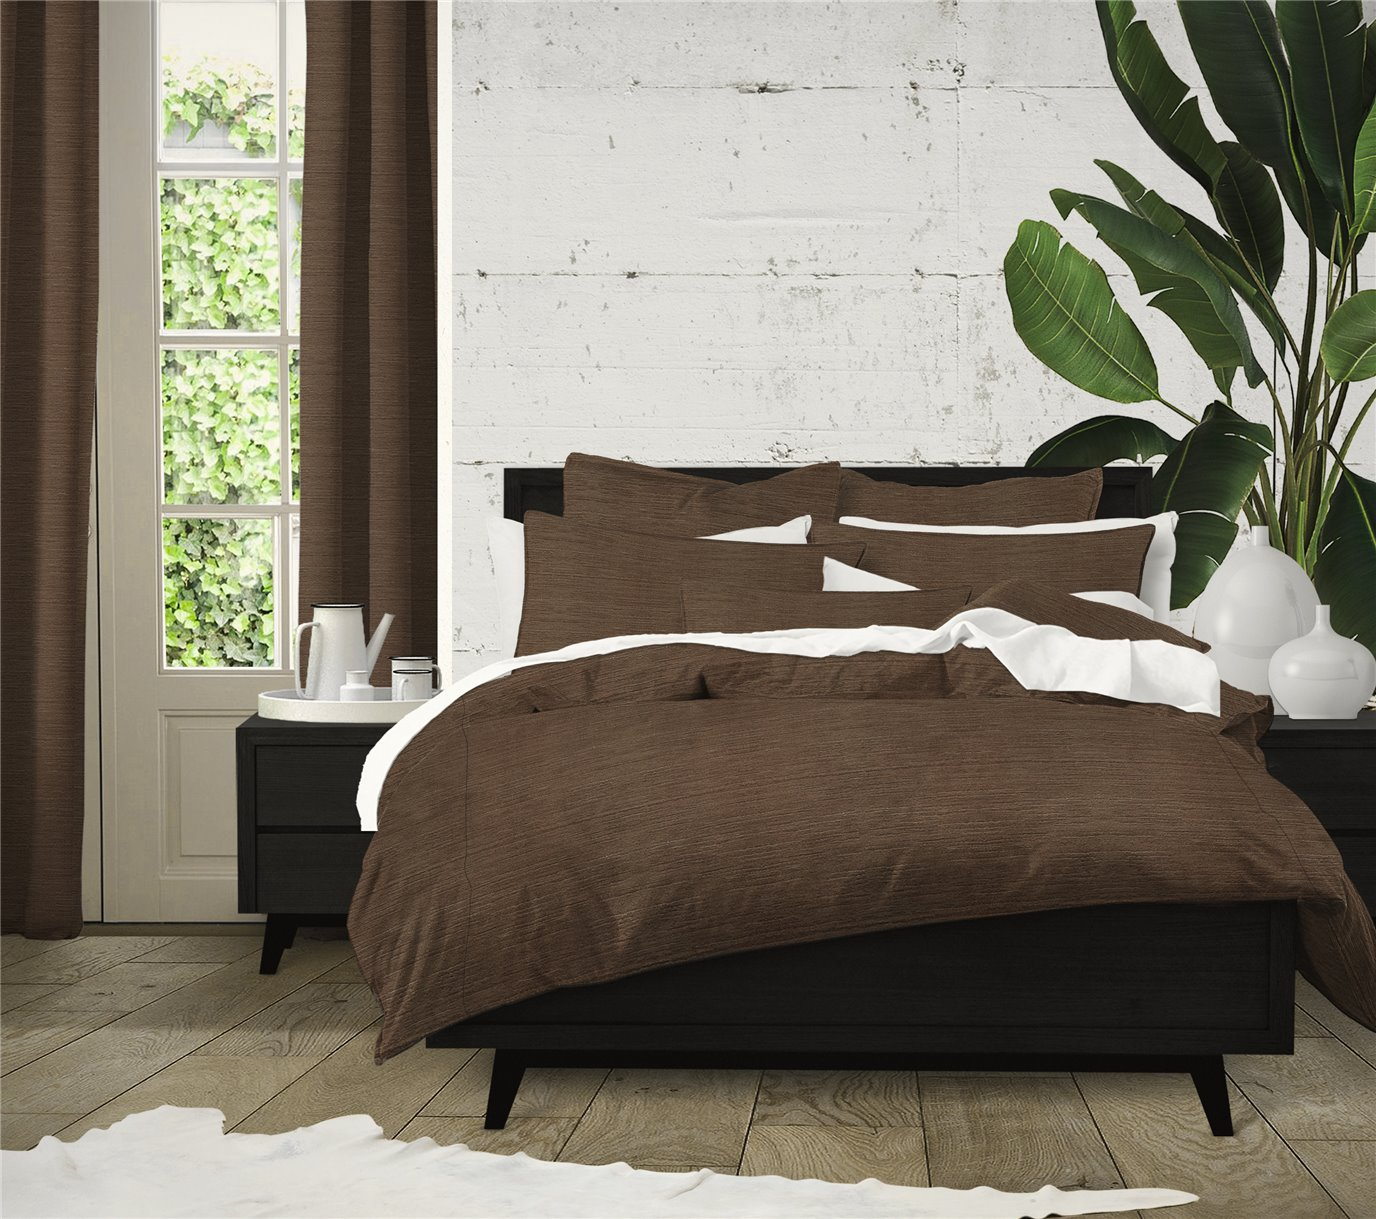 McGregor Chocolate Comforter Set - Super King